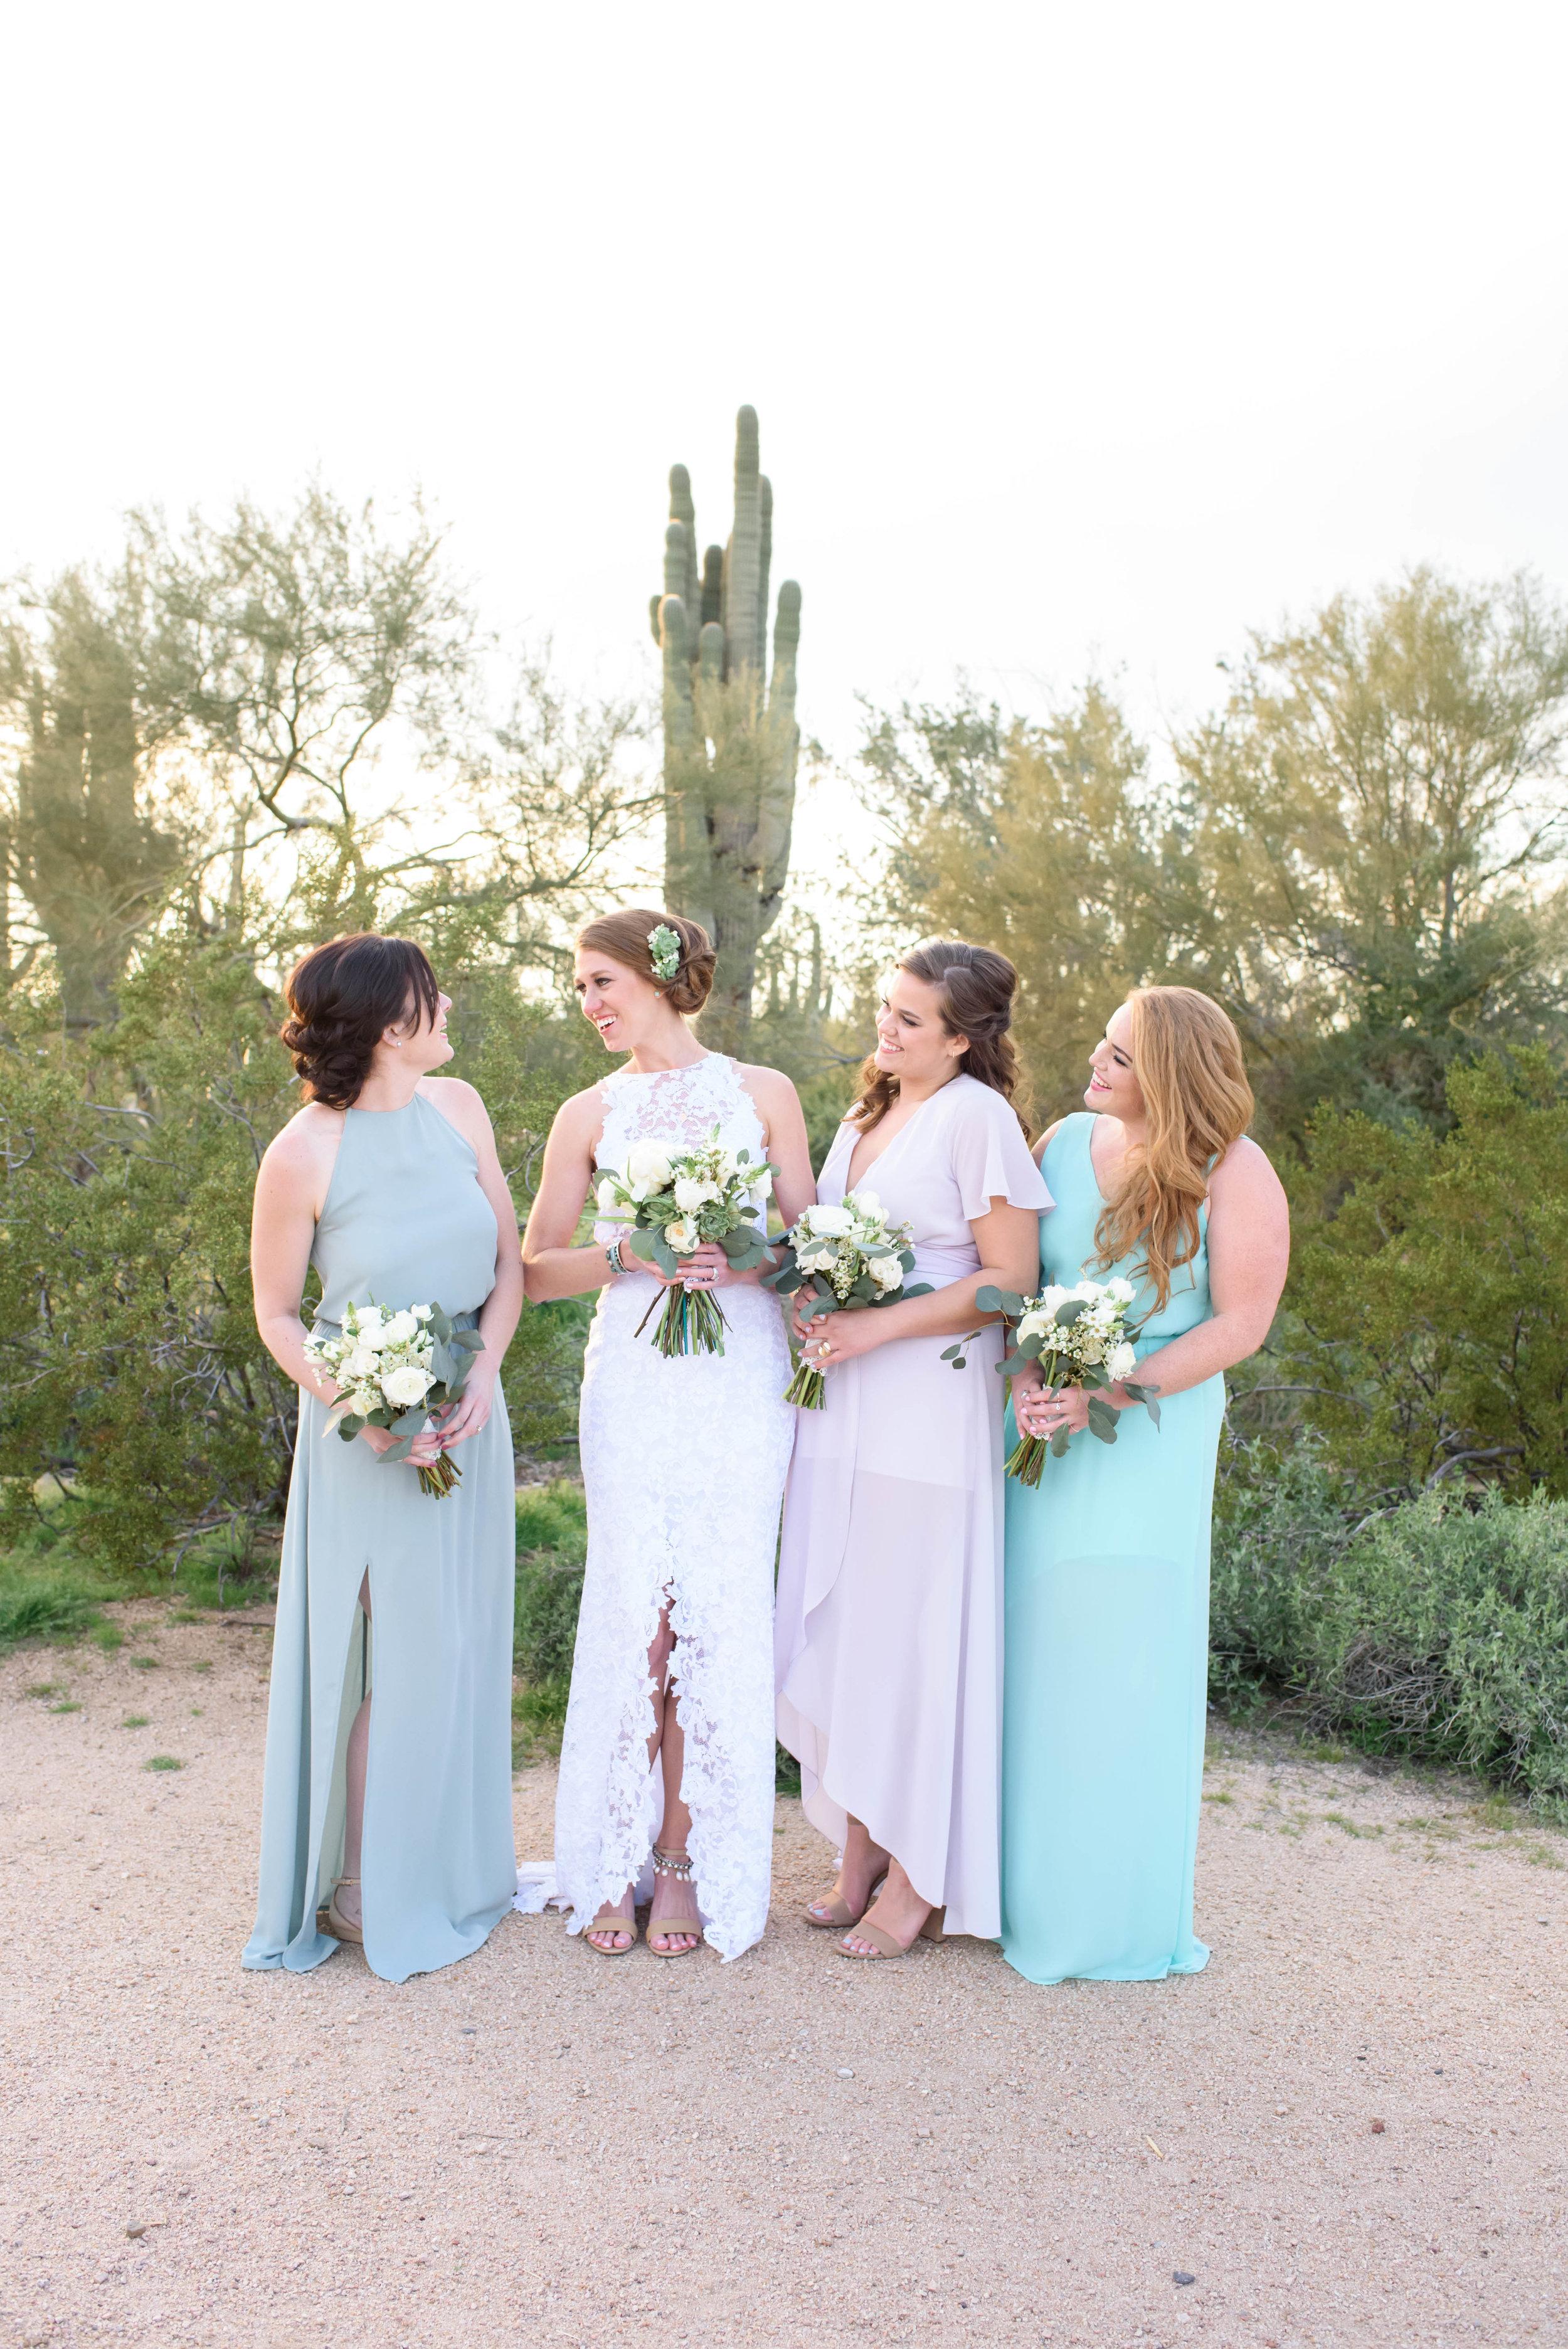 Colorful Desert Wedding - Bride and Bridesmaids